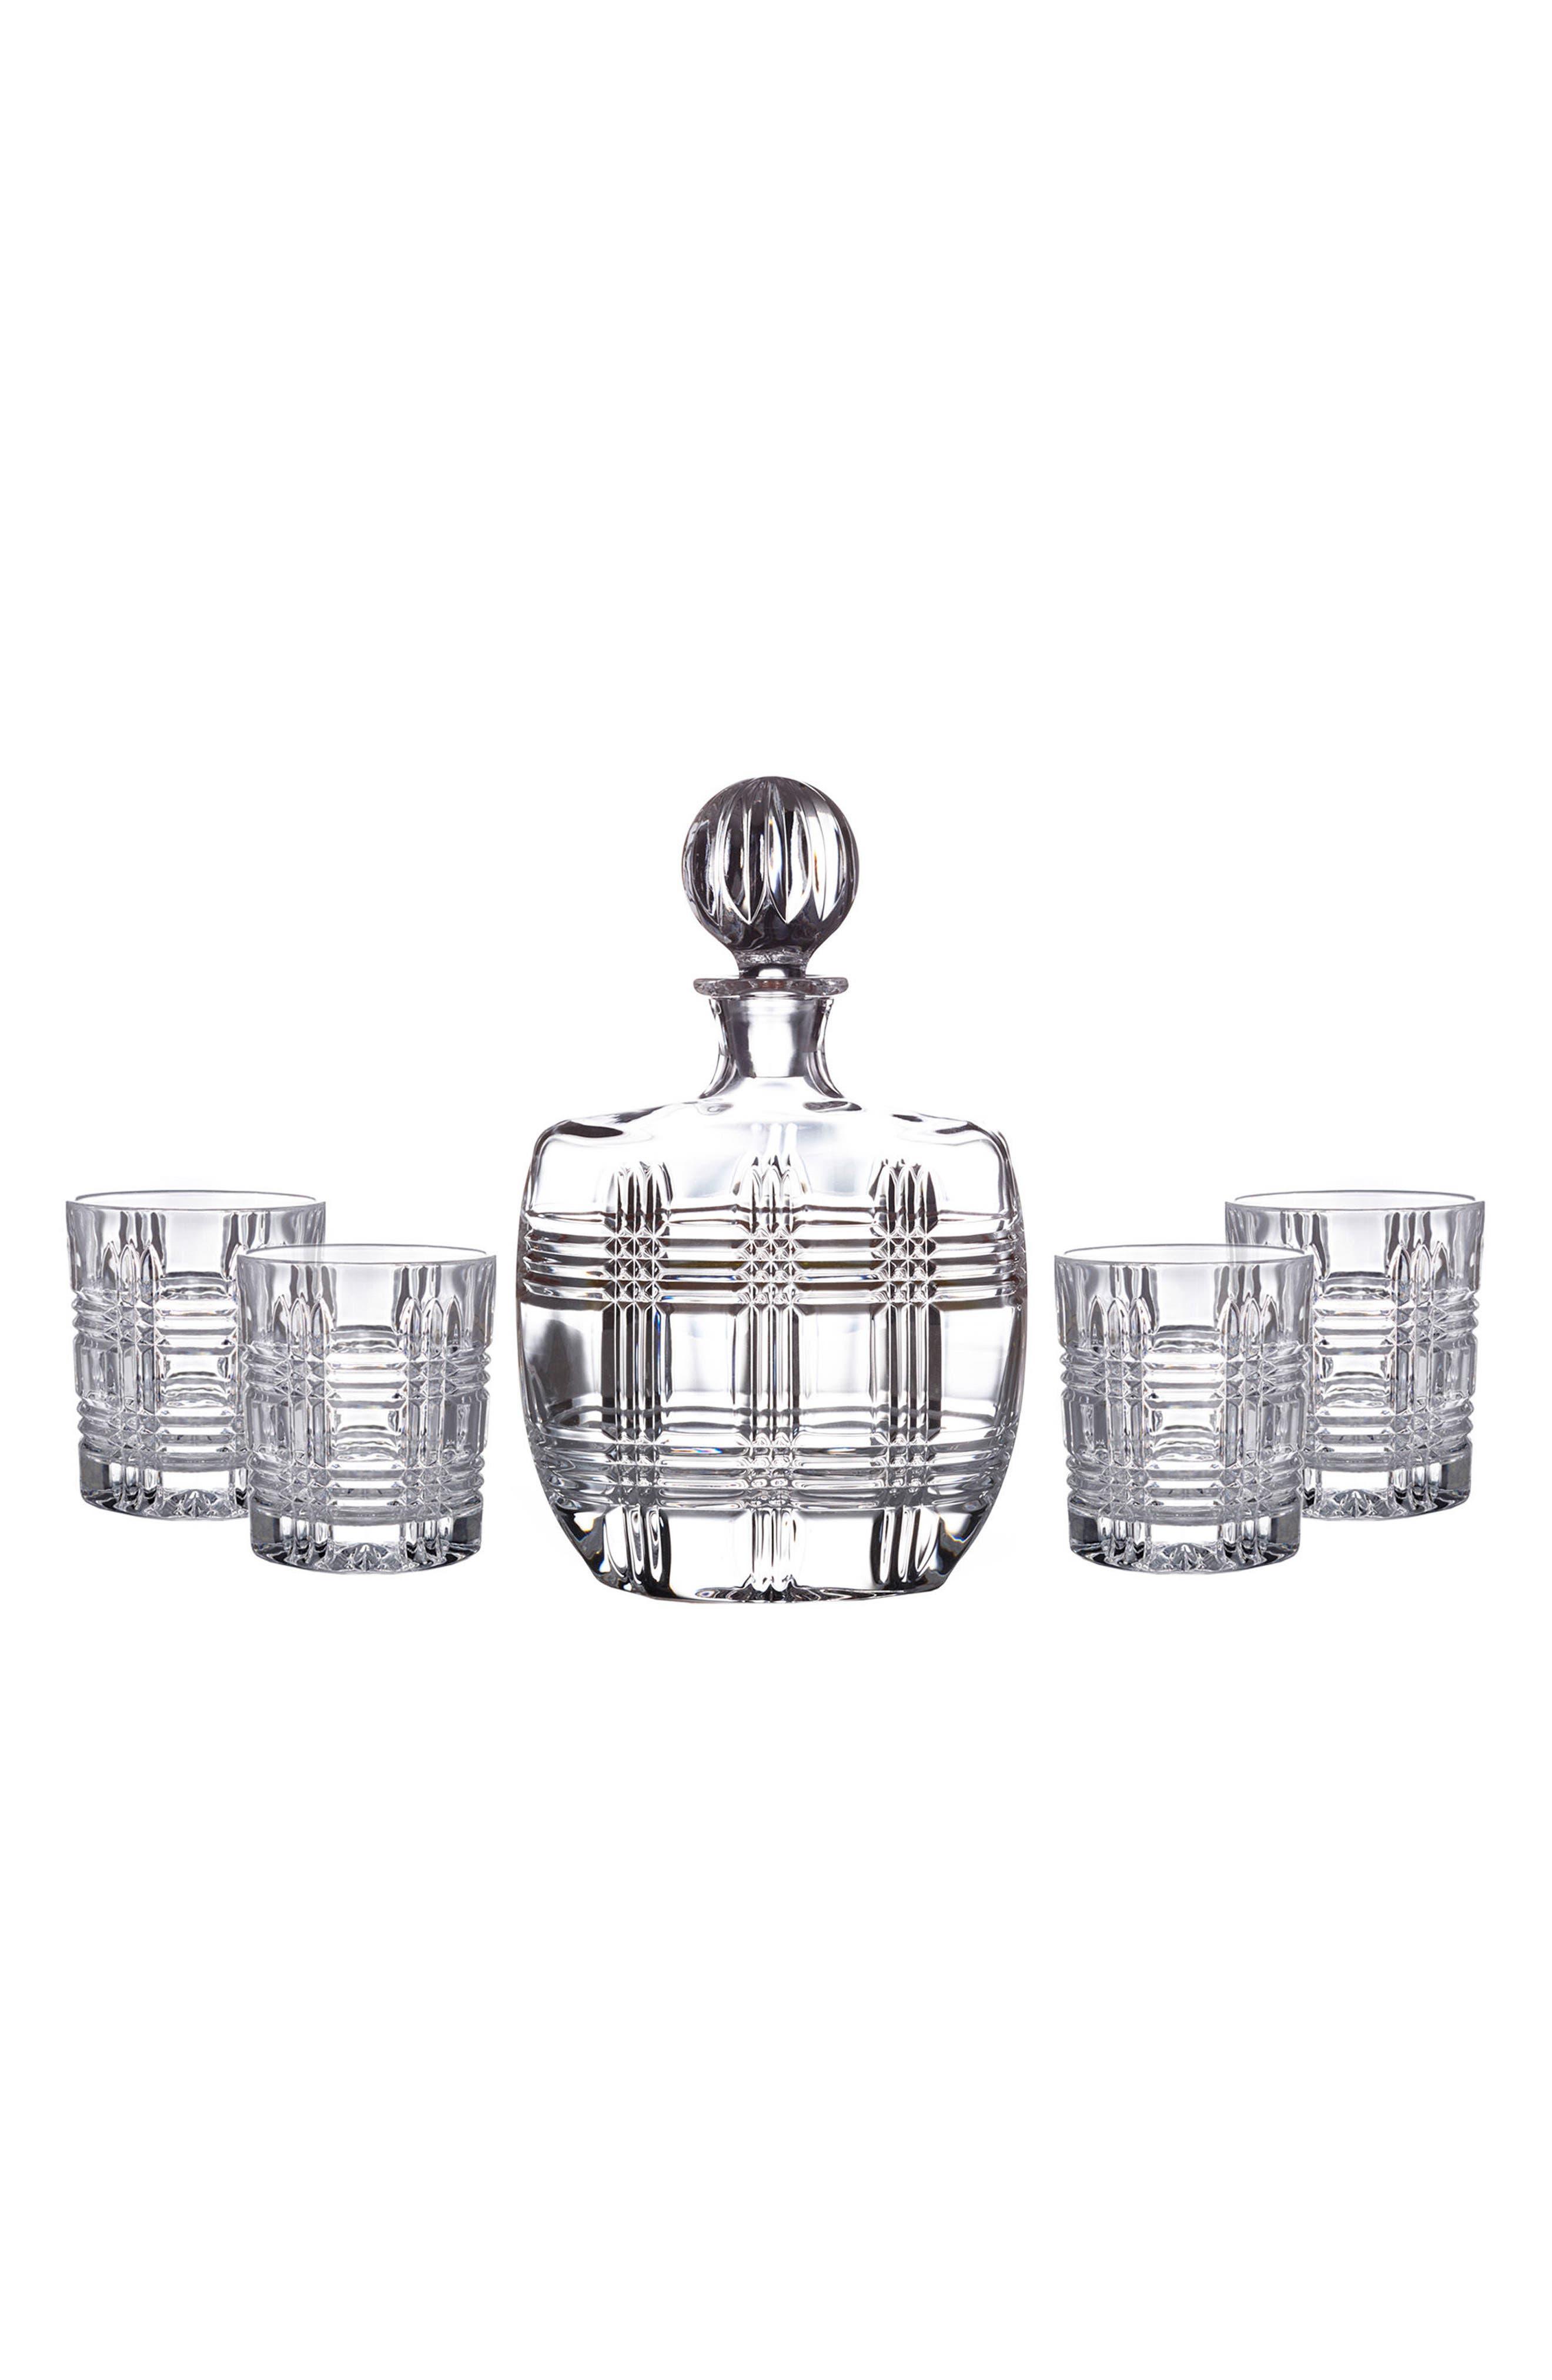 Bridgeport 5-Piece Decanter & Whiskey Glasses Set,                             Alternate thumbnail 2, color,                             100